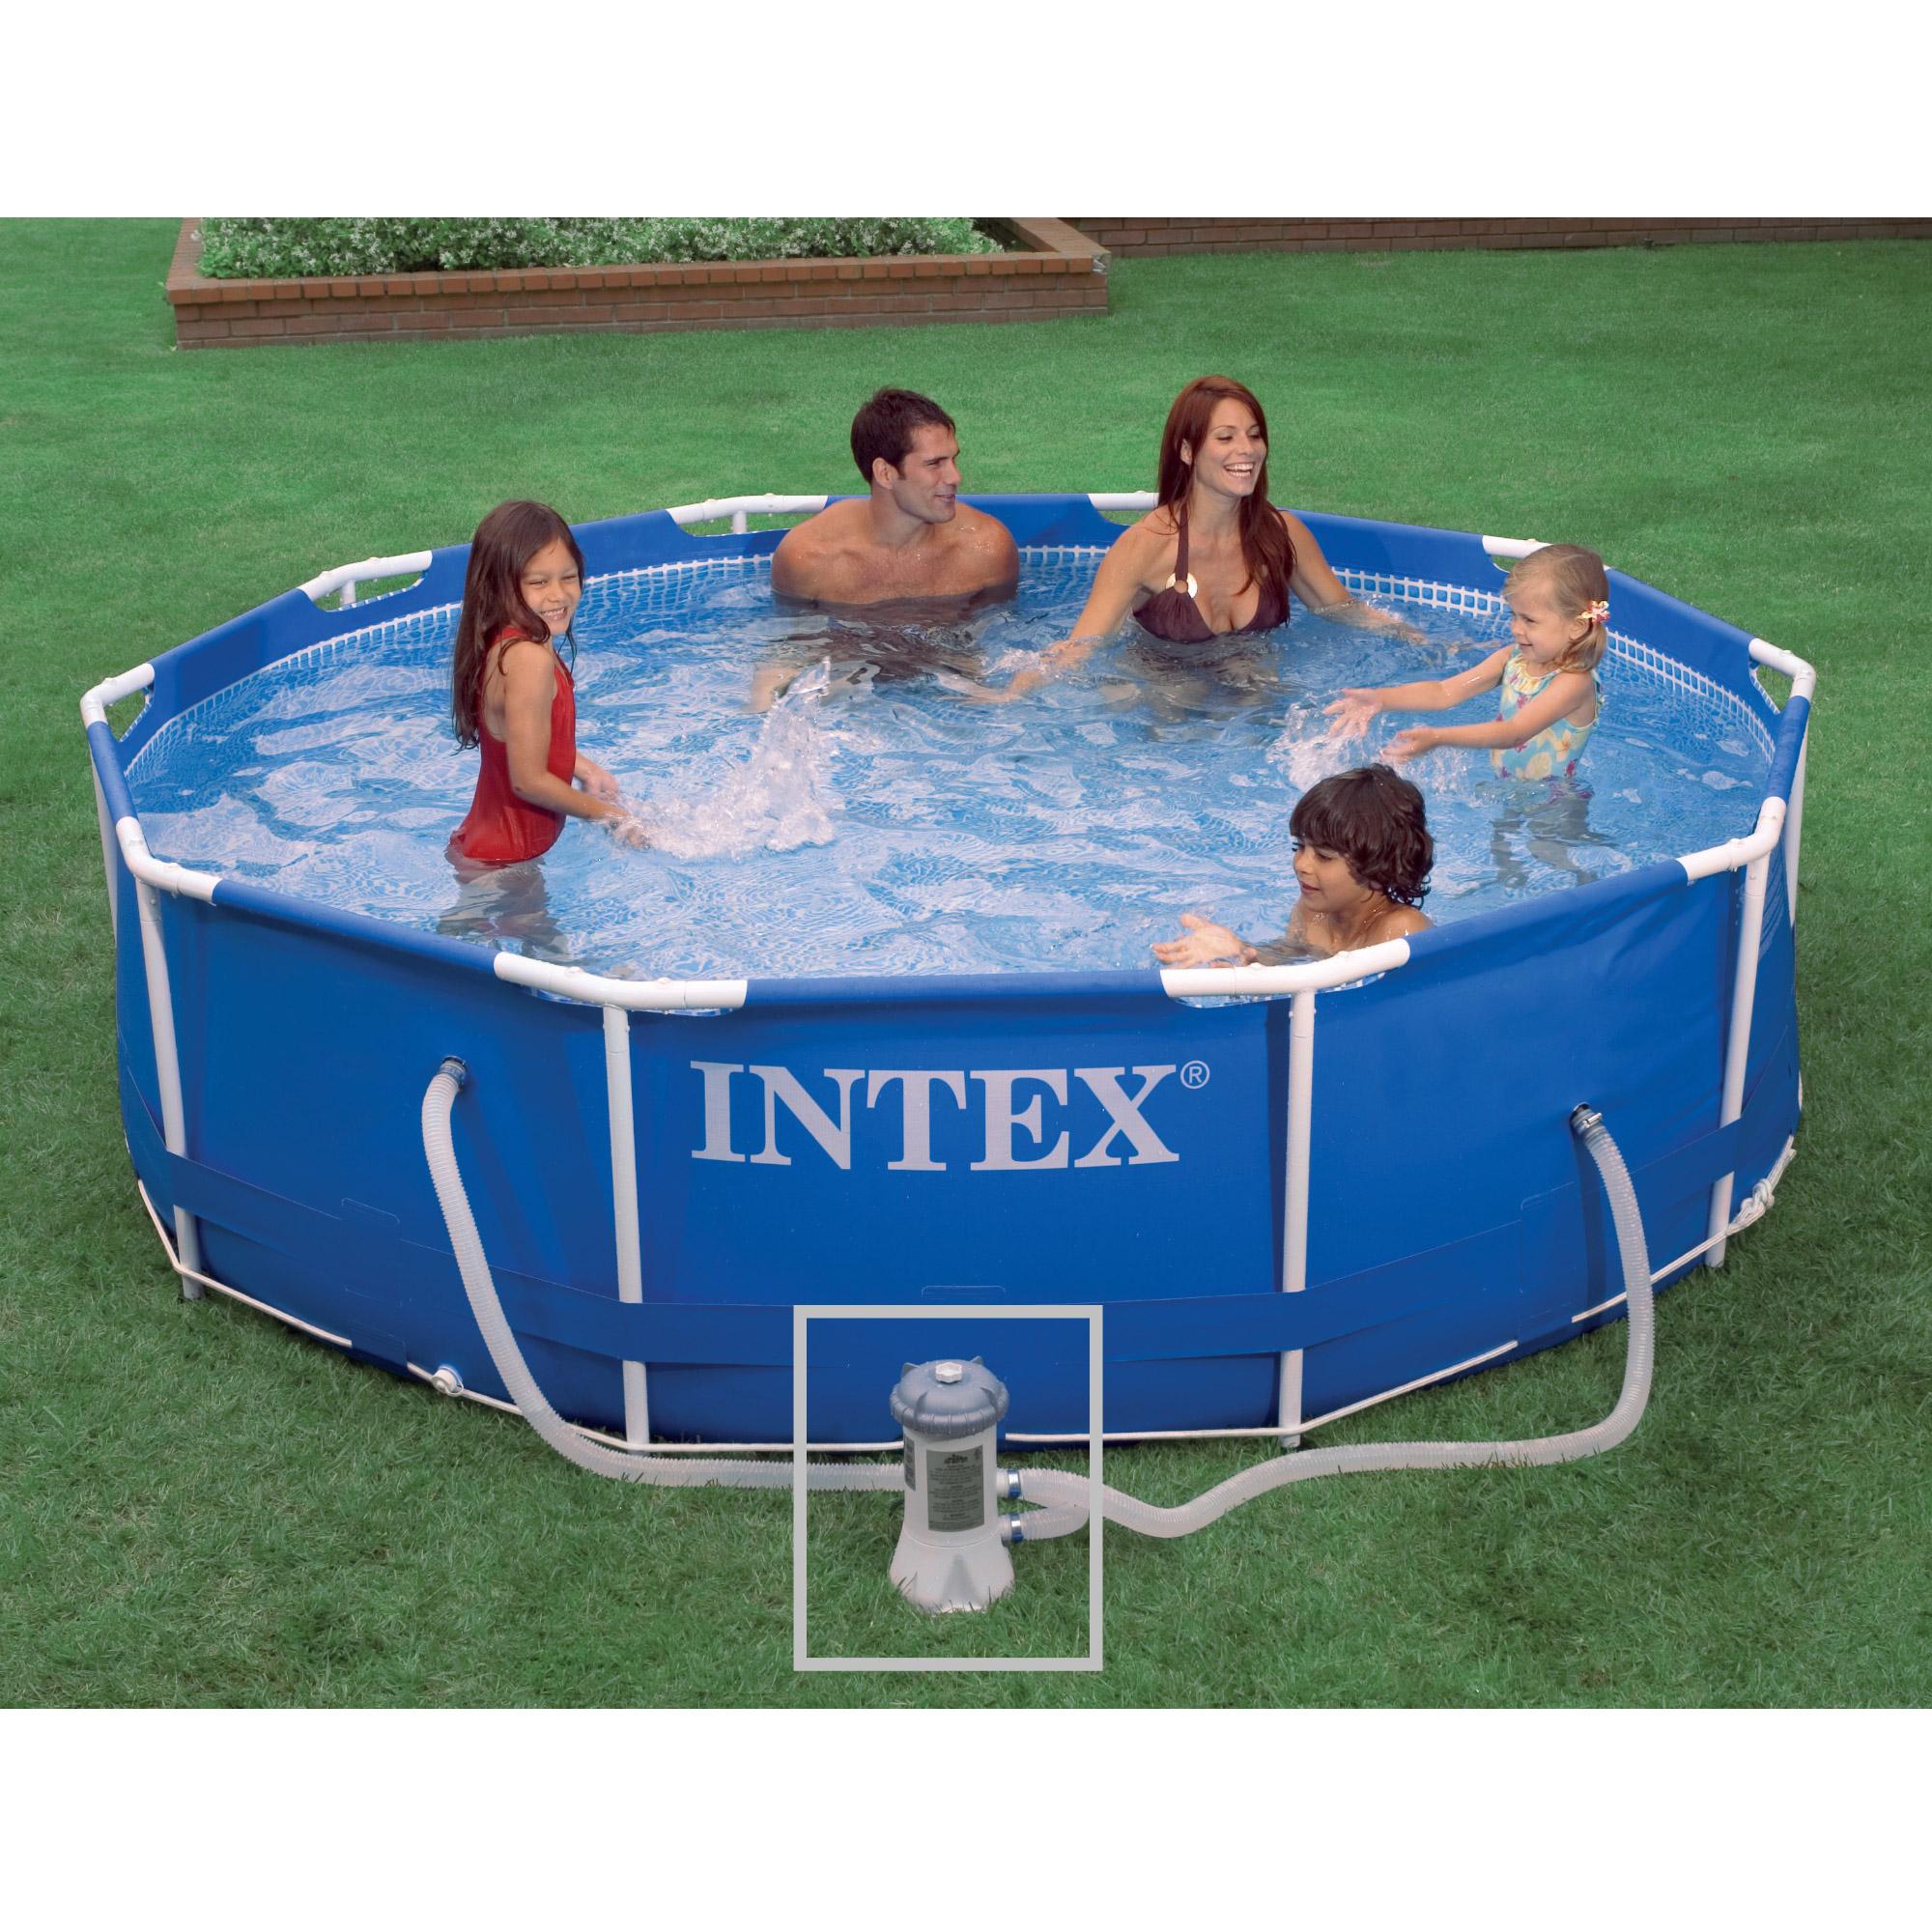 intex 28202fr piscine hors sol tubulaire ronde 305 x. Black Bedroom Furniture Sets. Home Design Ideas